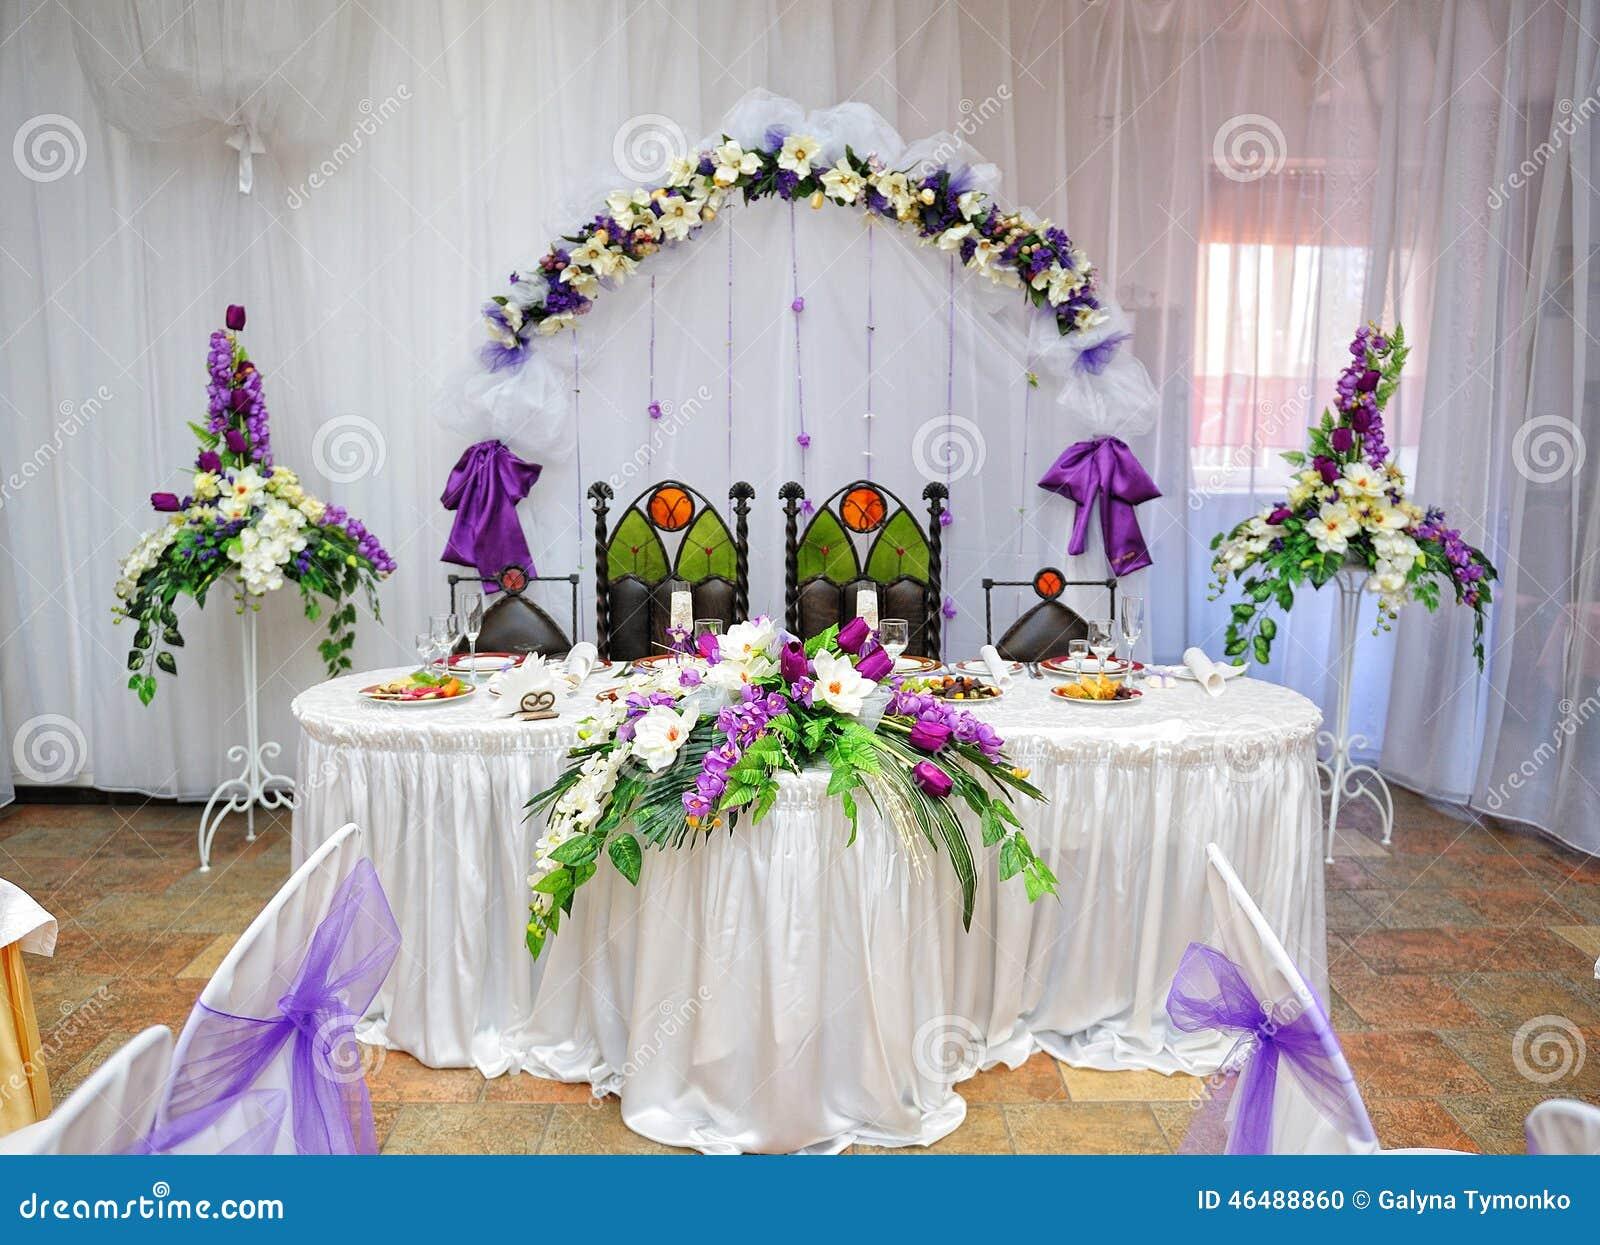 jeunes mari s de d coration de table de mariage photo. Black Bedroom Furniture Sets. Home Design Ideas